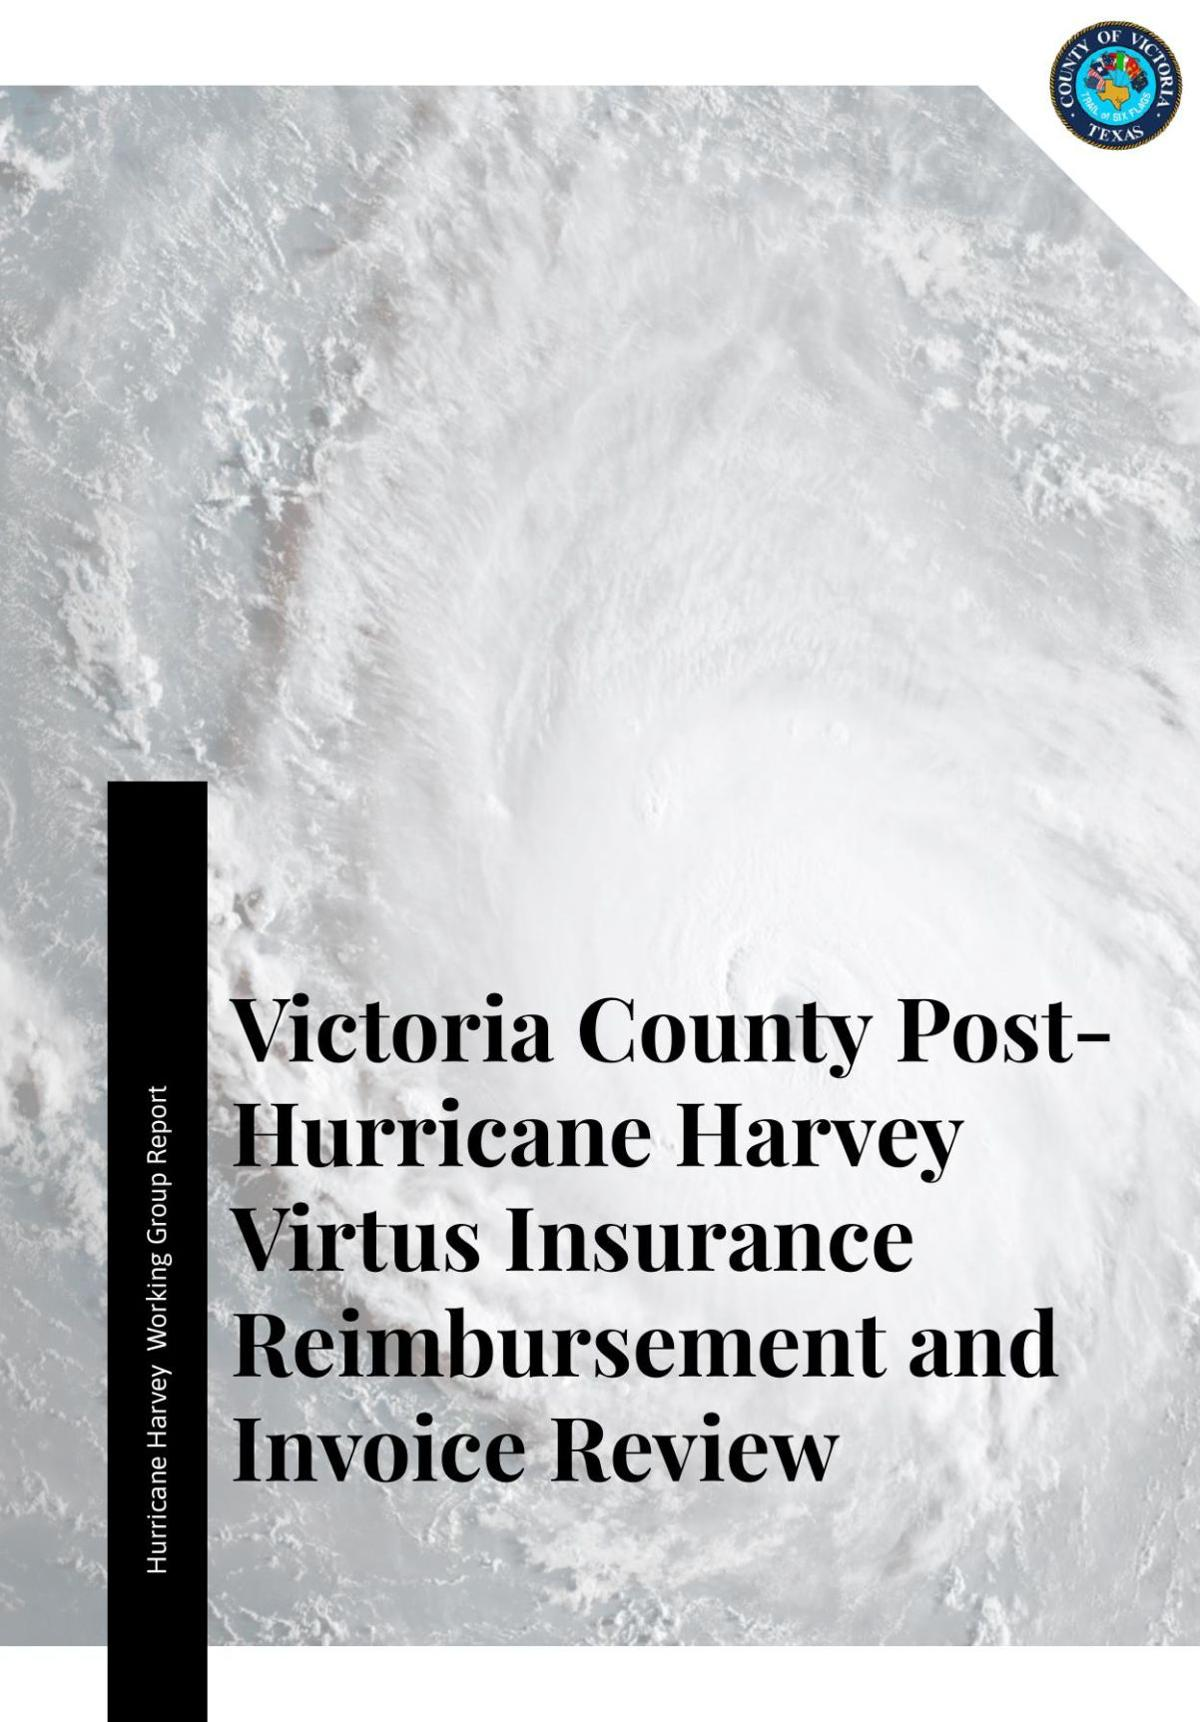 Commissioner Janak's Harvey Report